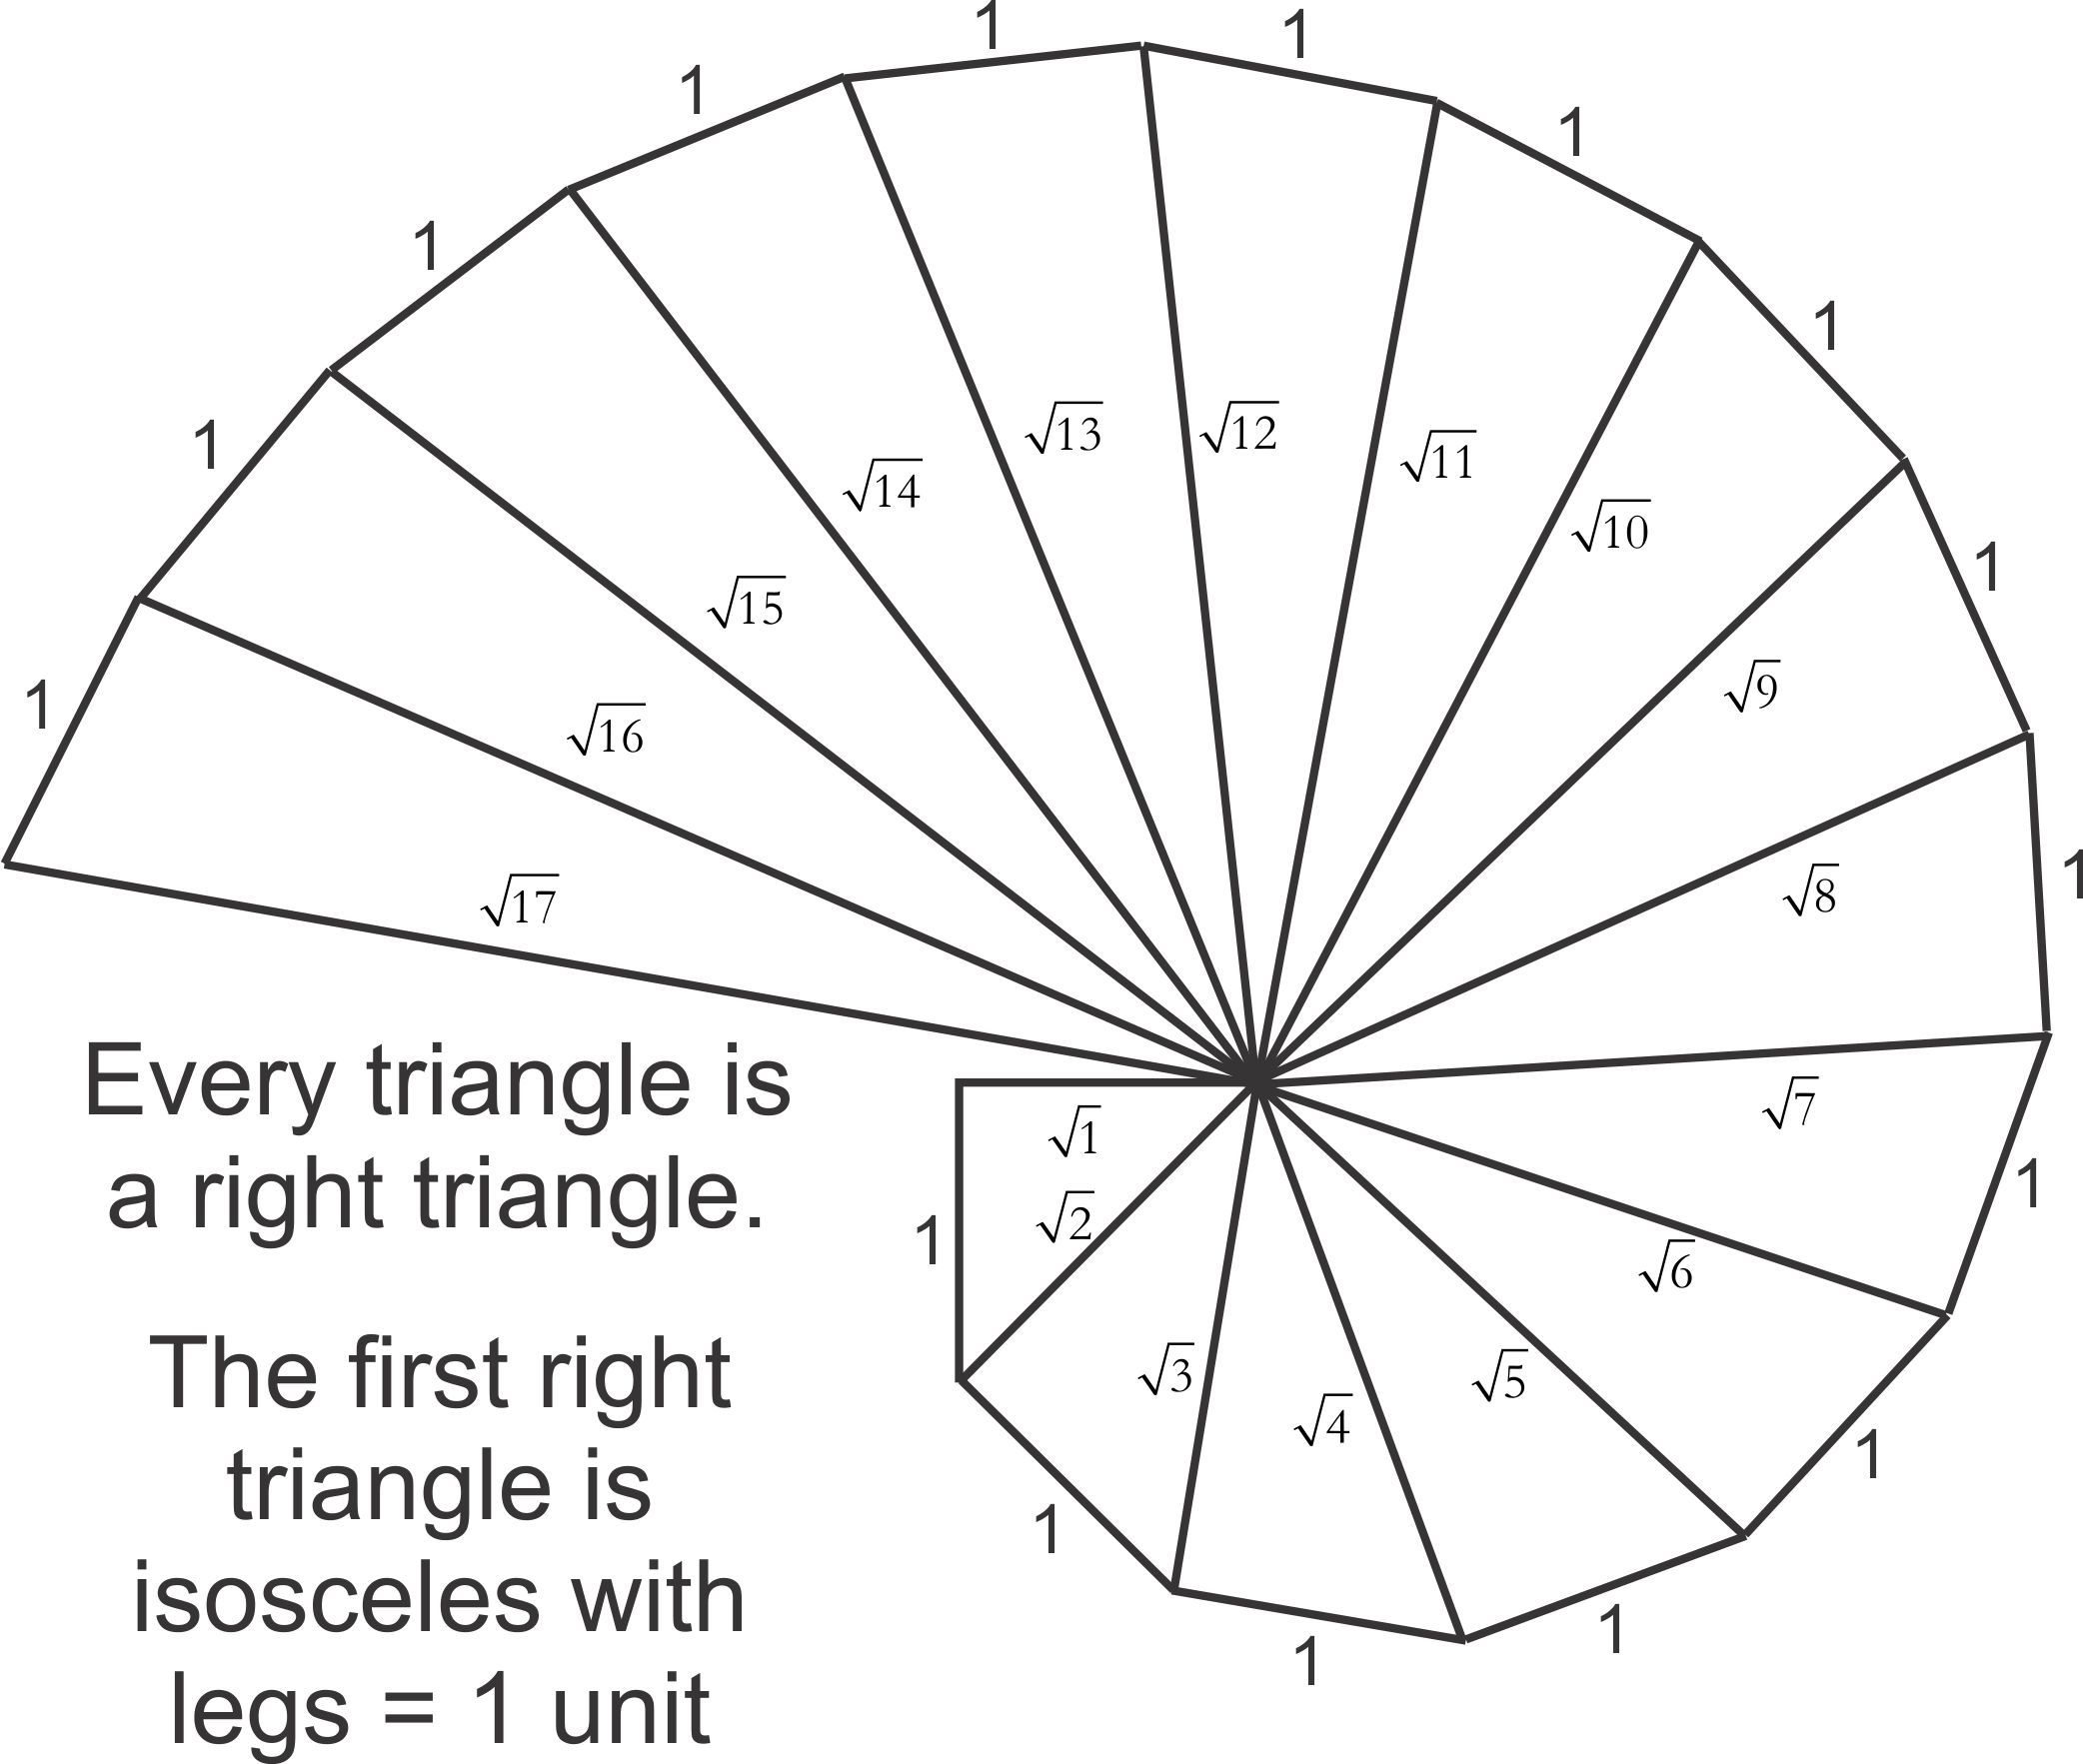 medium resolution of square root spiral square roots mathematics cosmic spiral ferris wheel fair